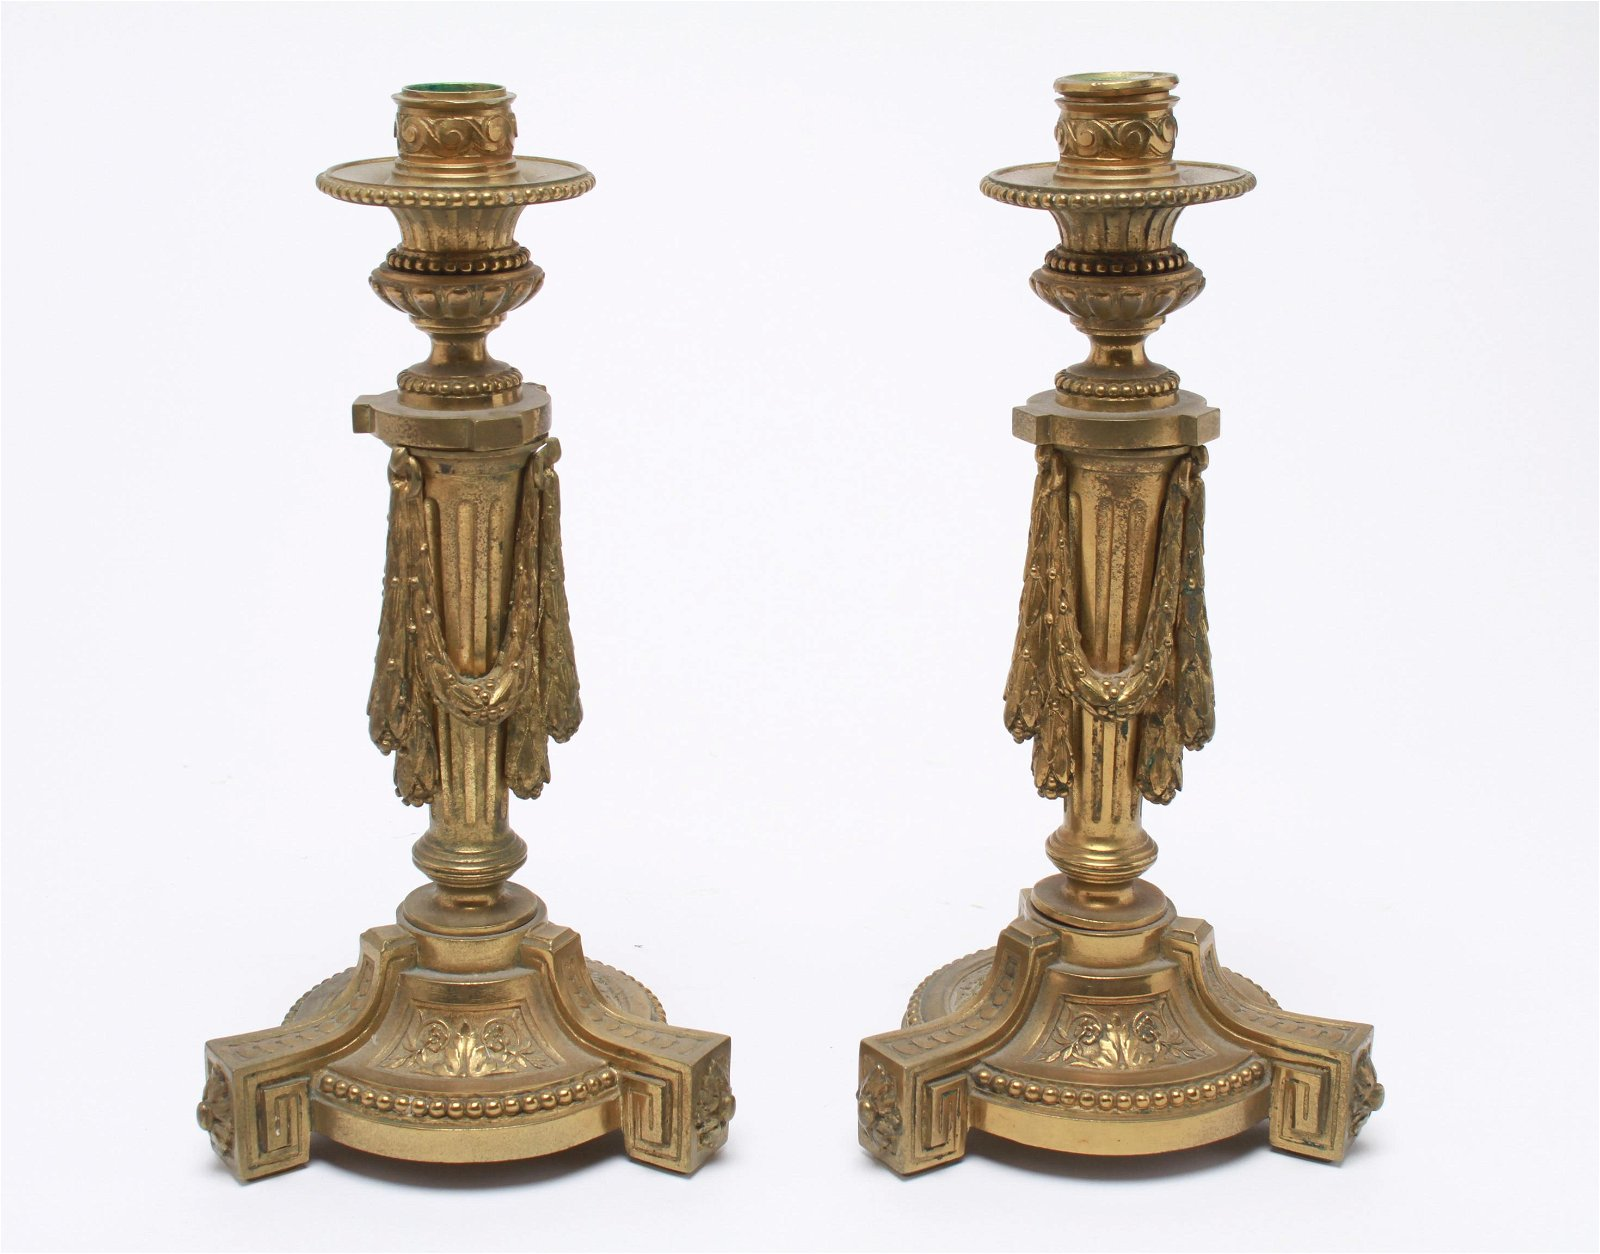 Antique French Empire Bronze Candlesticks, Pair